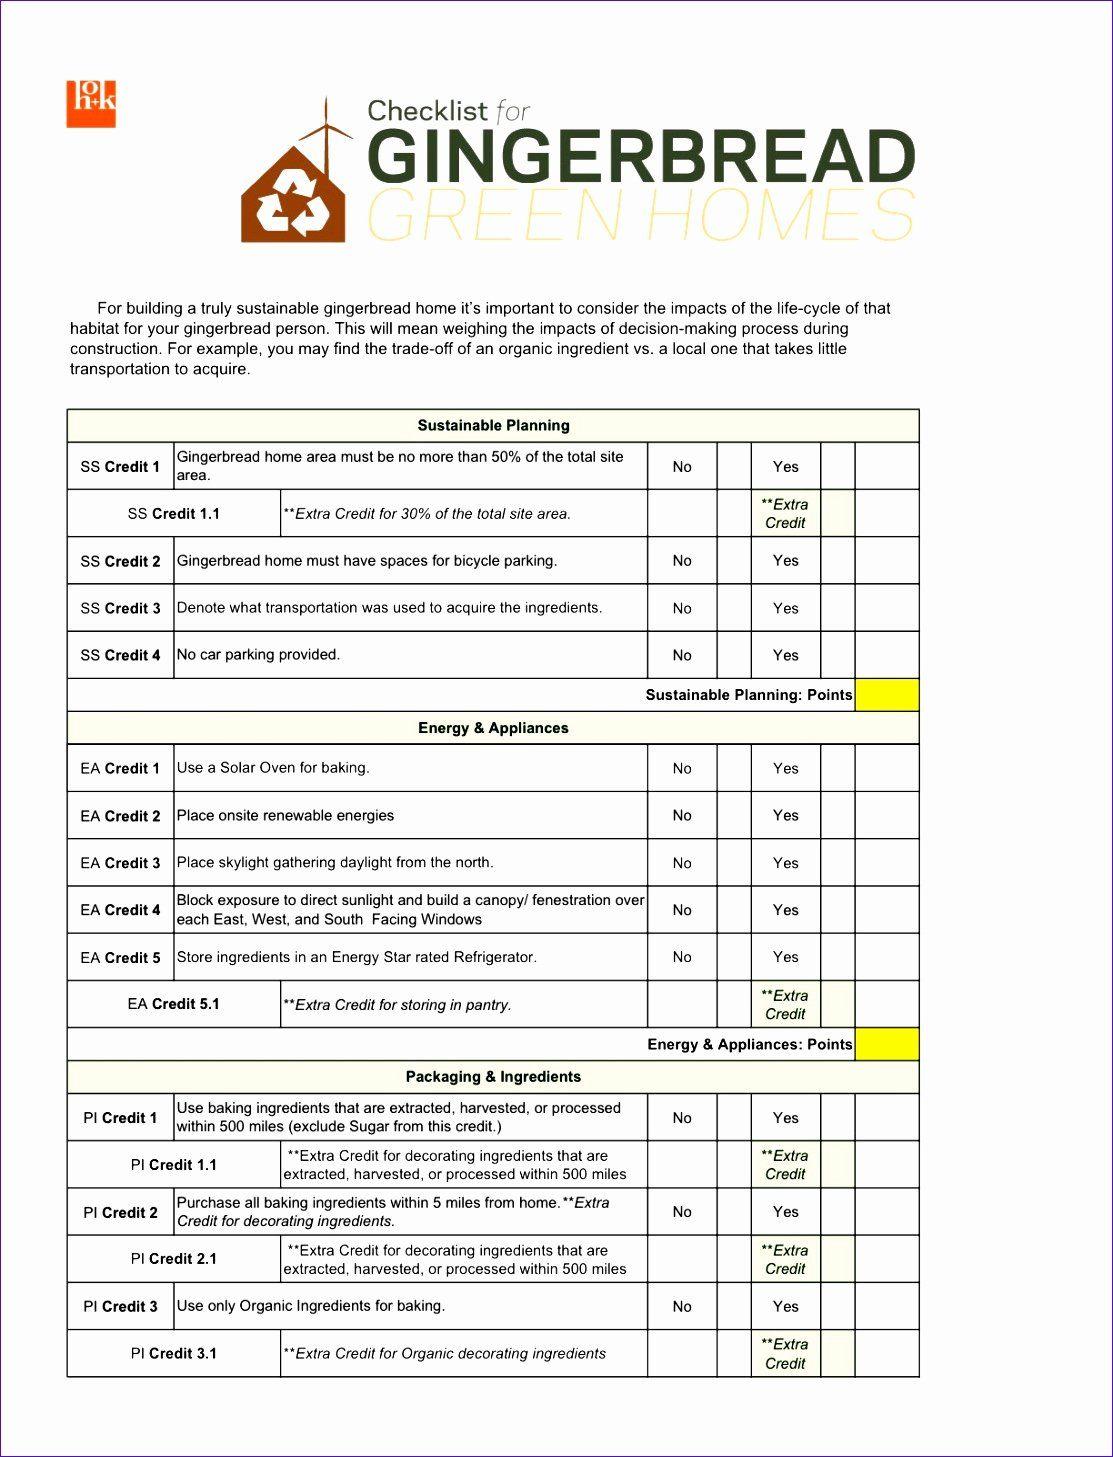 Home Renovation Checklist Template Elegant 11 Quality Checklist Template Excel Exceltemplates Checklist Template New Construction Checklist New Home Checklist New construction punch list template